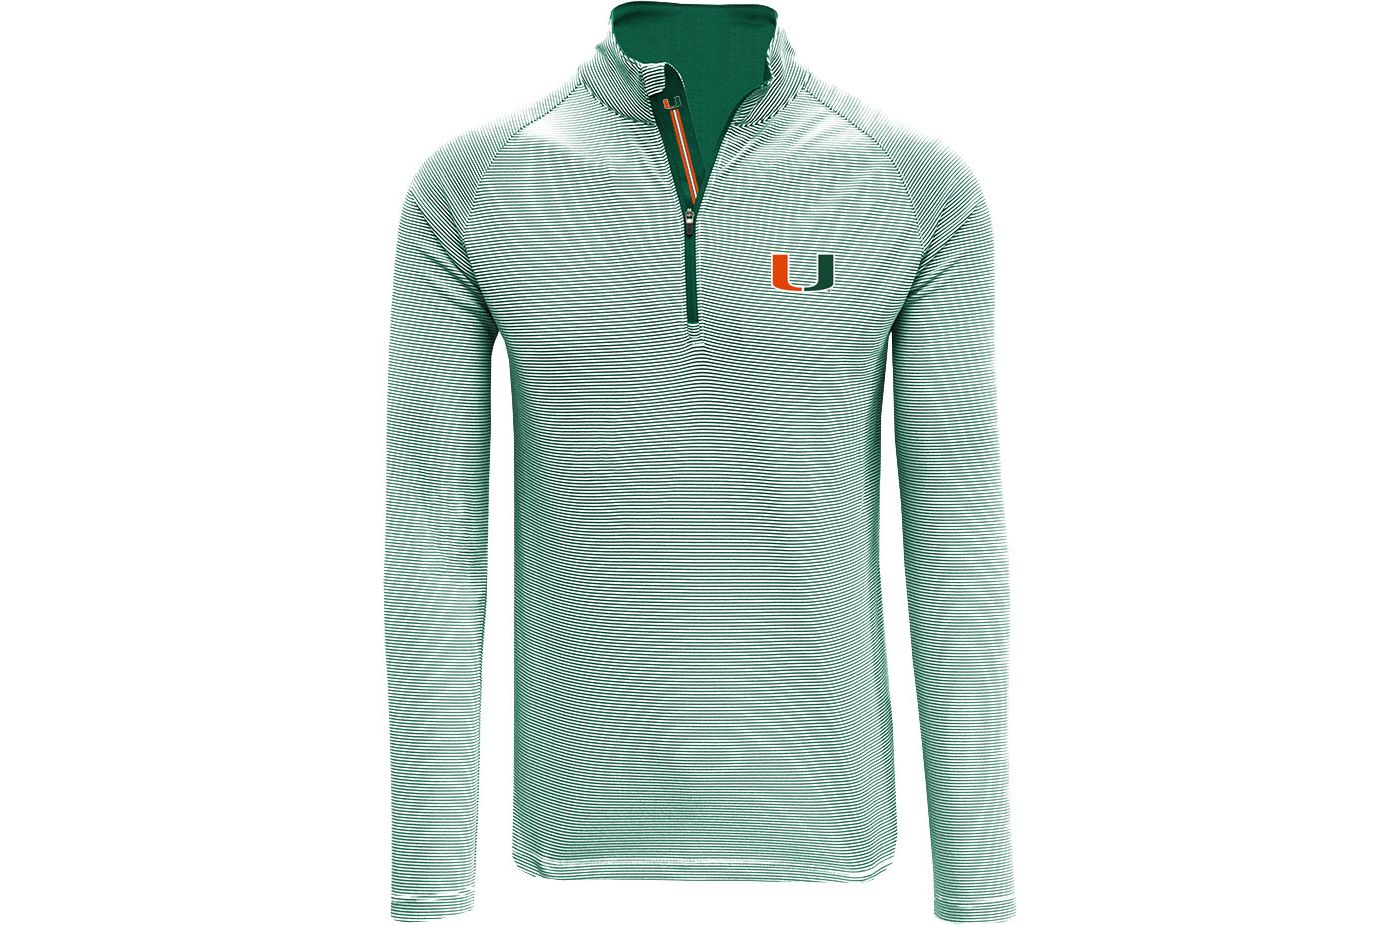 Levelwear Men's Miami Hurricanes Green Orion Quarter-Zip Shirt